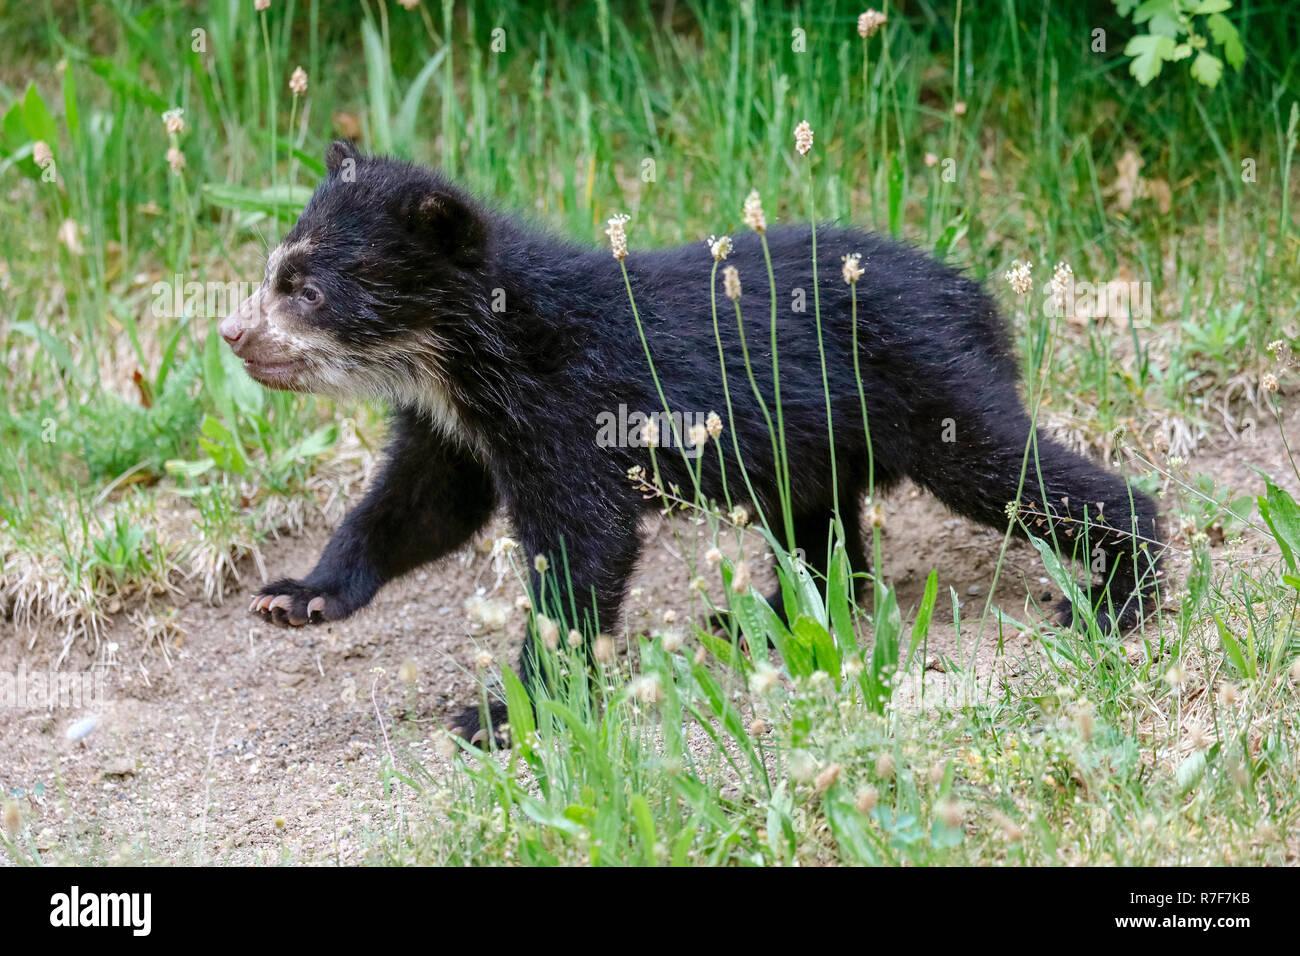 Spectacled bear, Andean bear (Tremarctos ornatus) young animal climbing, captive Stock Photo